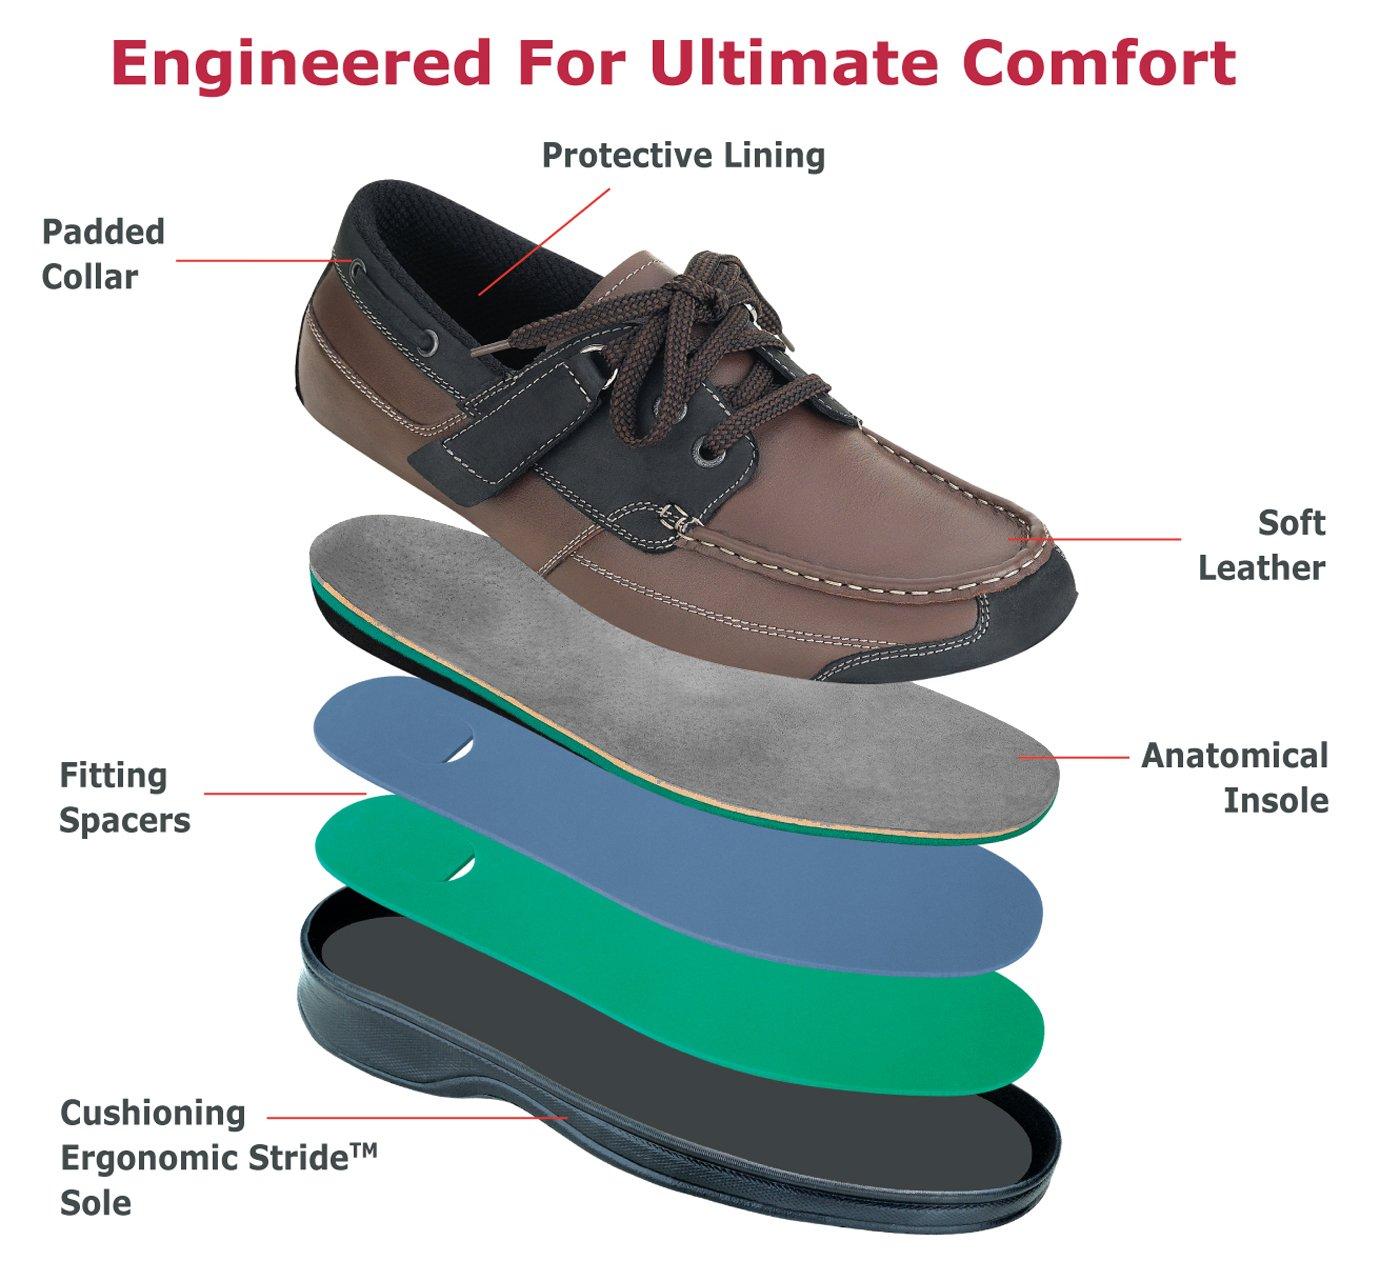 Orthofeet Baton Rouge Comfort Arthritis Orthopedic Mens Diabetic Boat Shoes Brown/Black Leather 11 XW US by Orthofeet (Image #6)